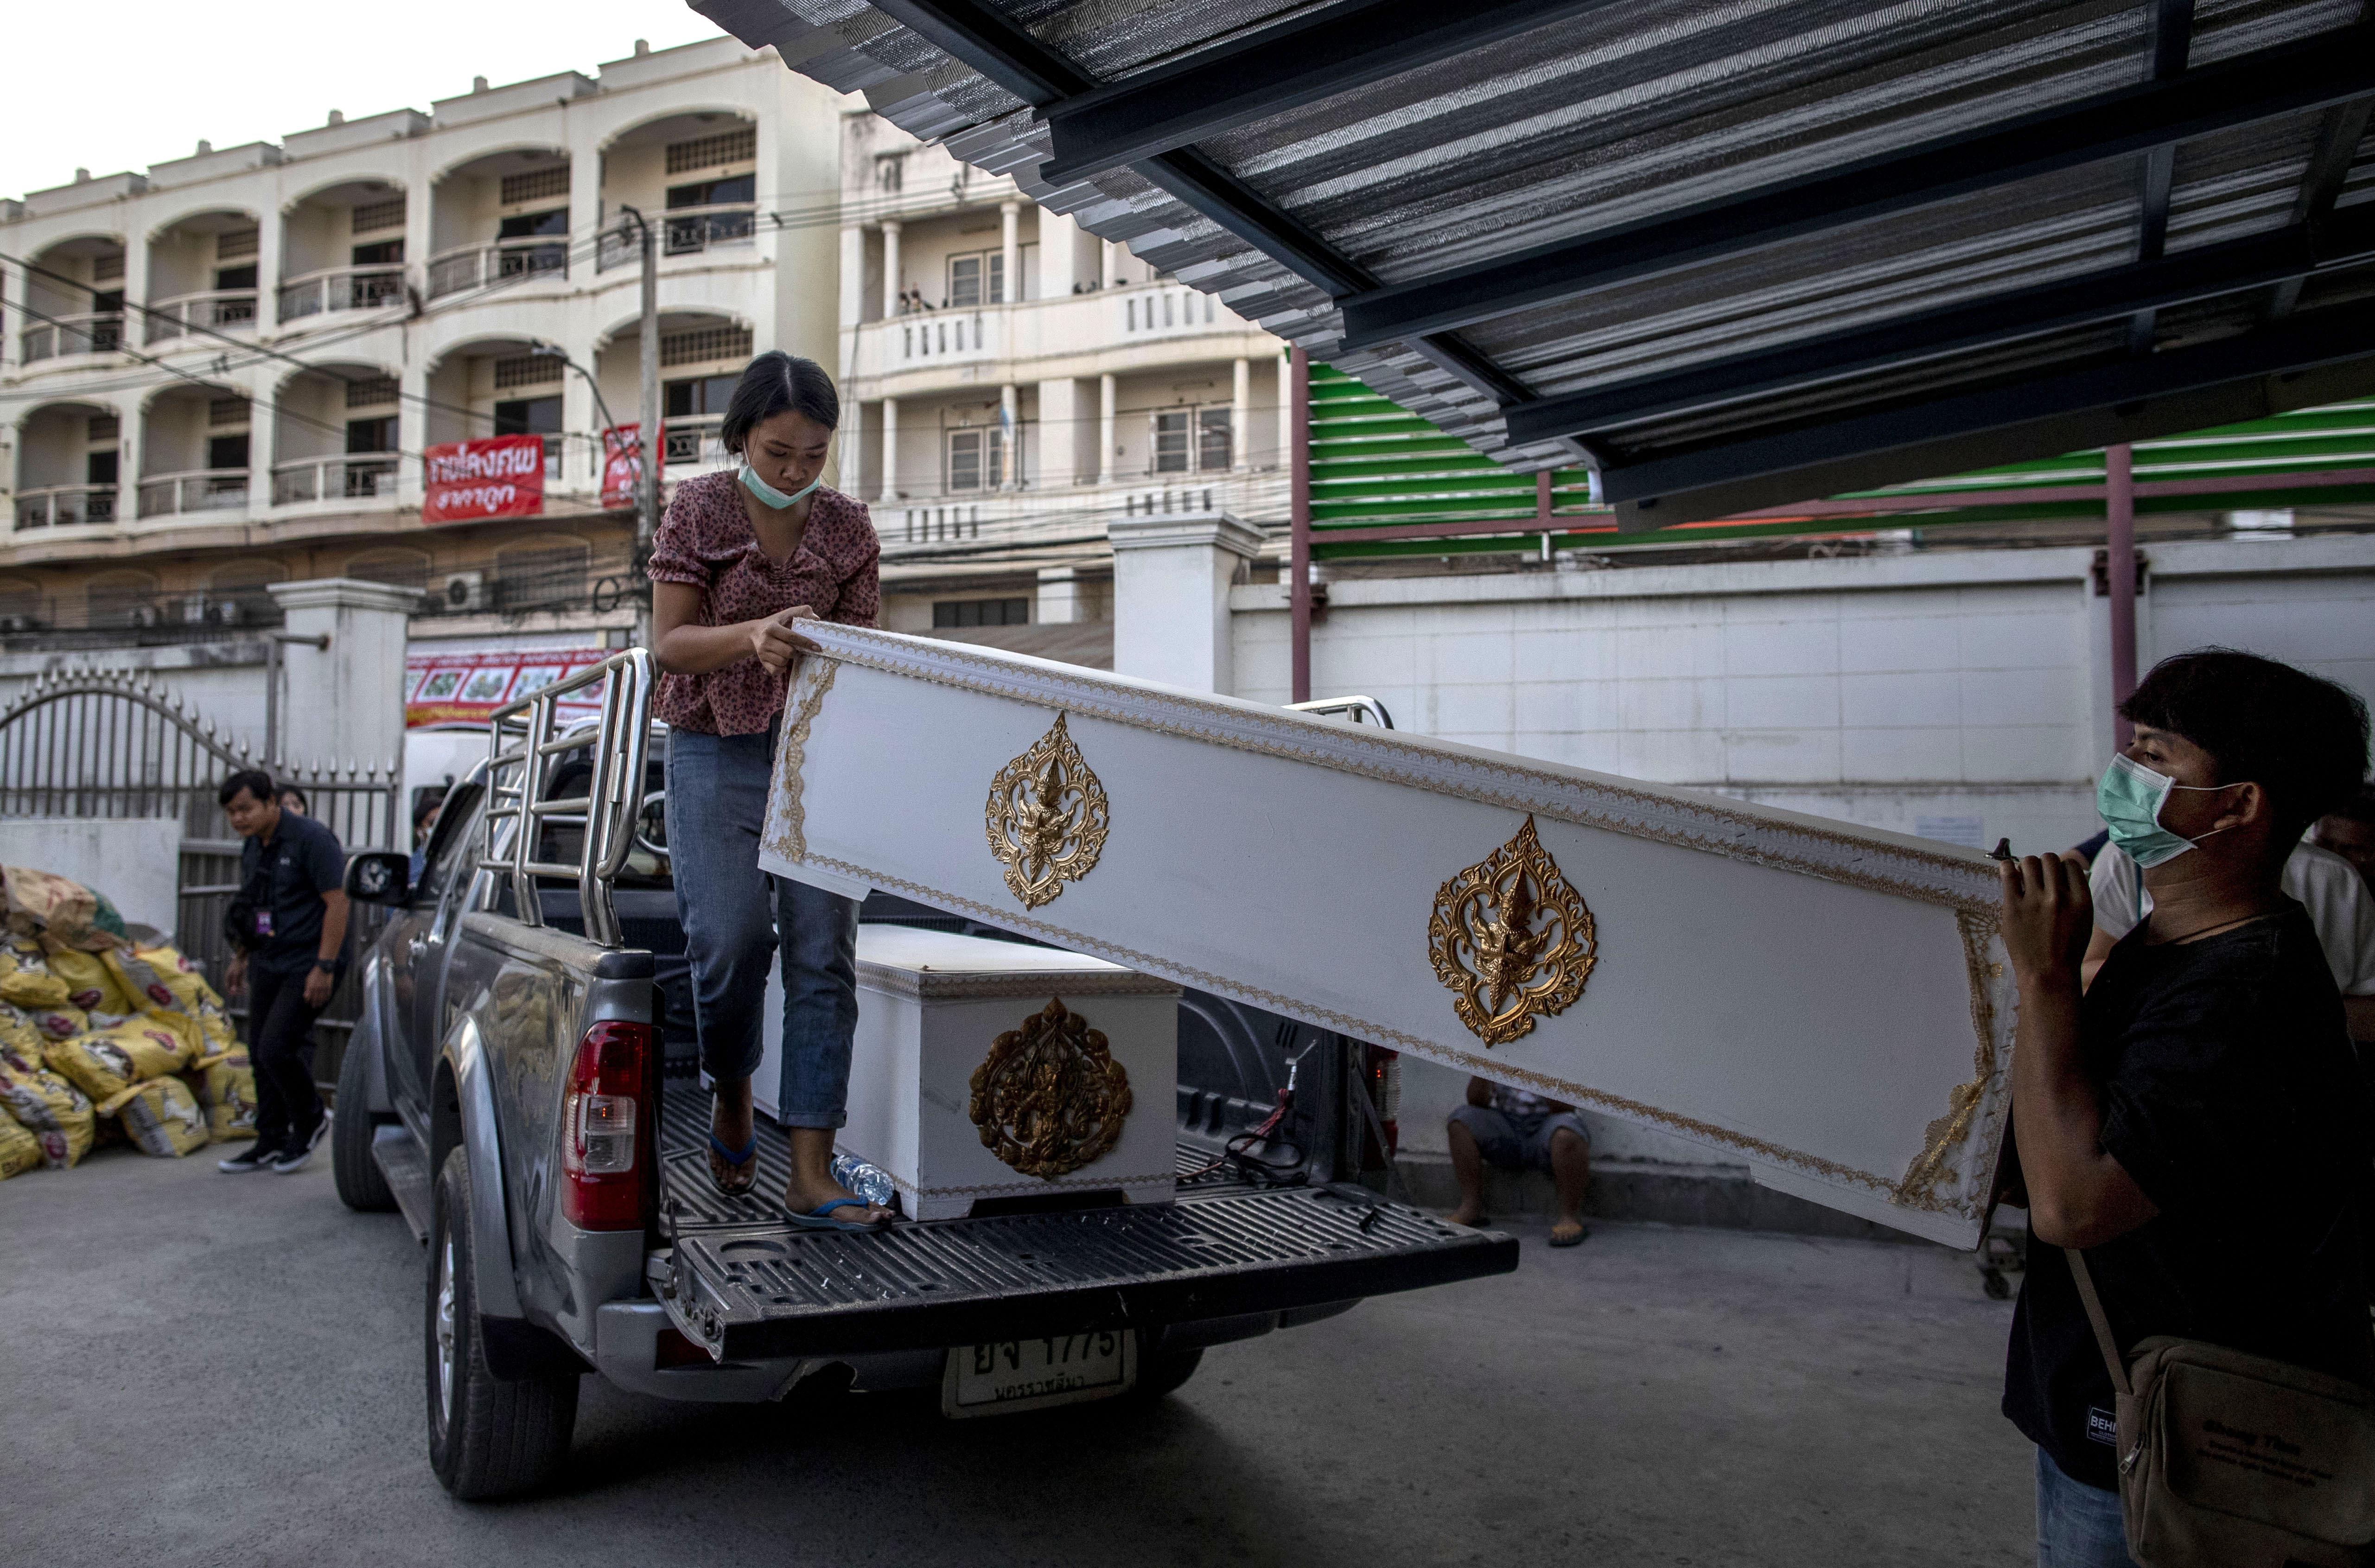 Morgue staff carry in coffins in Korat, Nakhon Ratchasima, Thailand